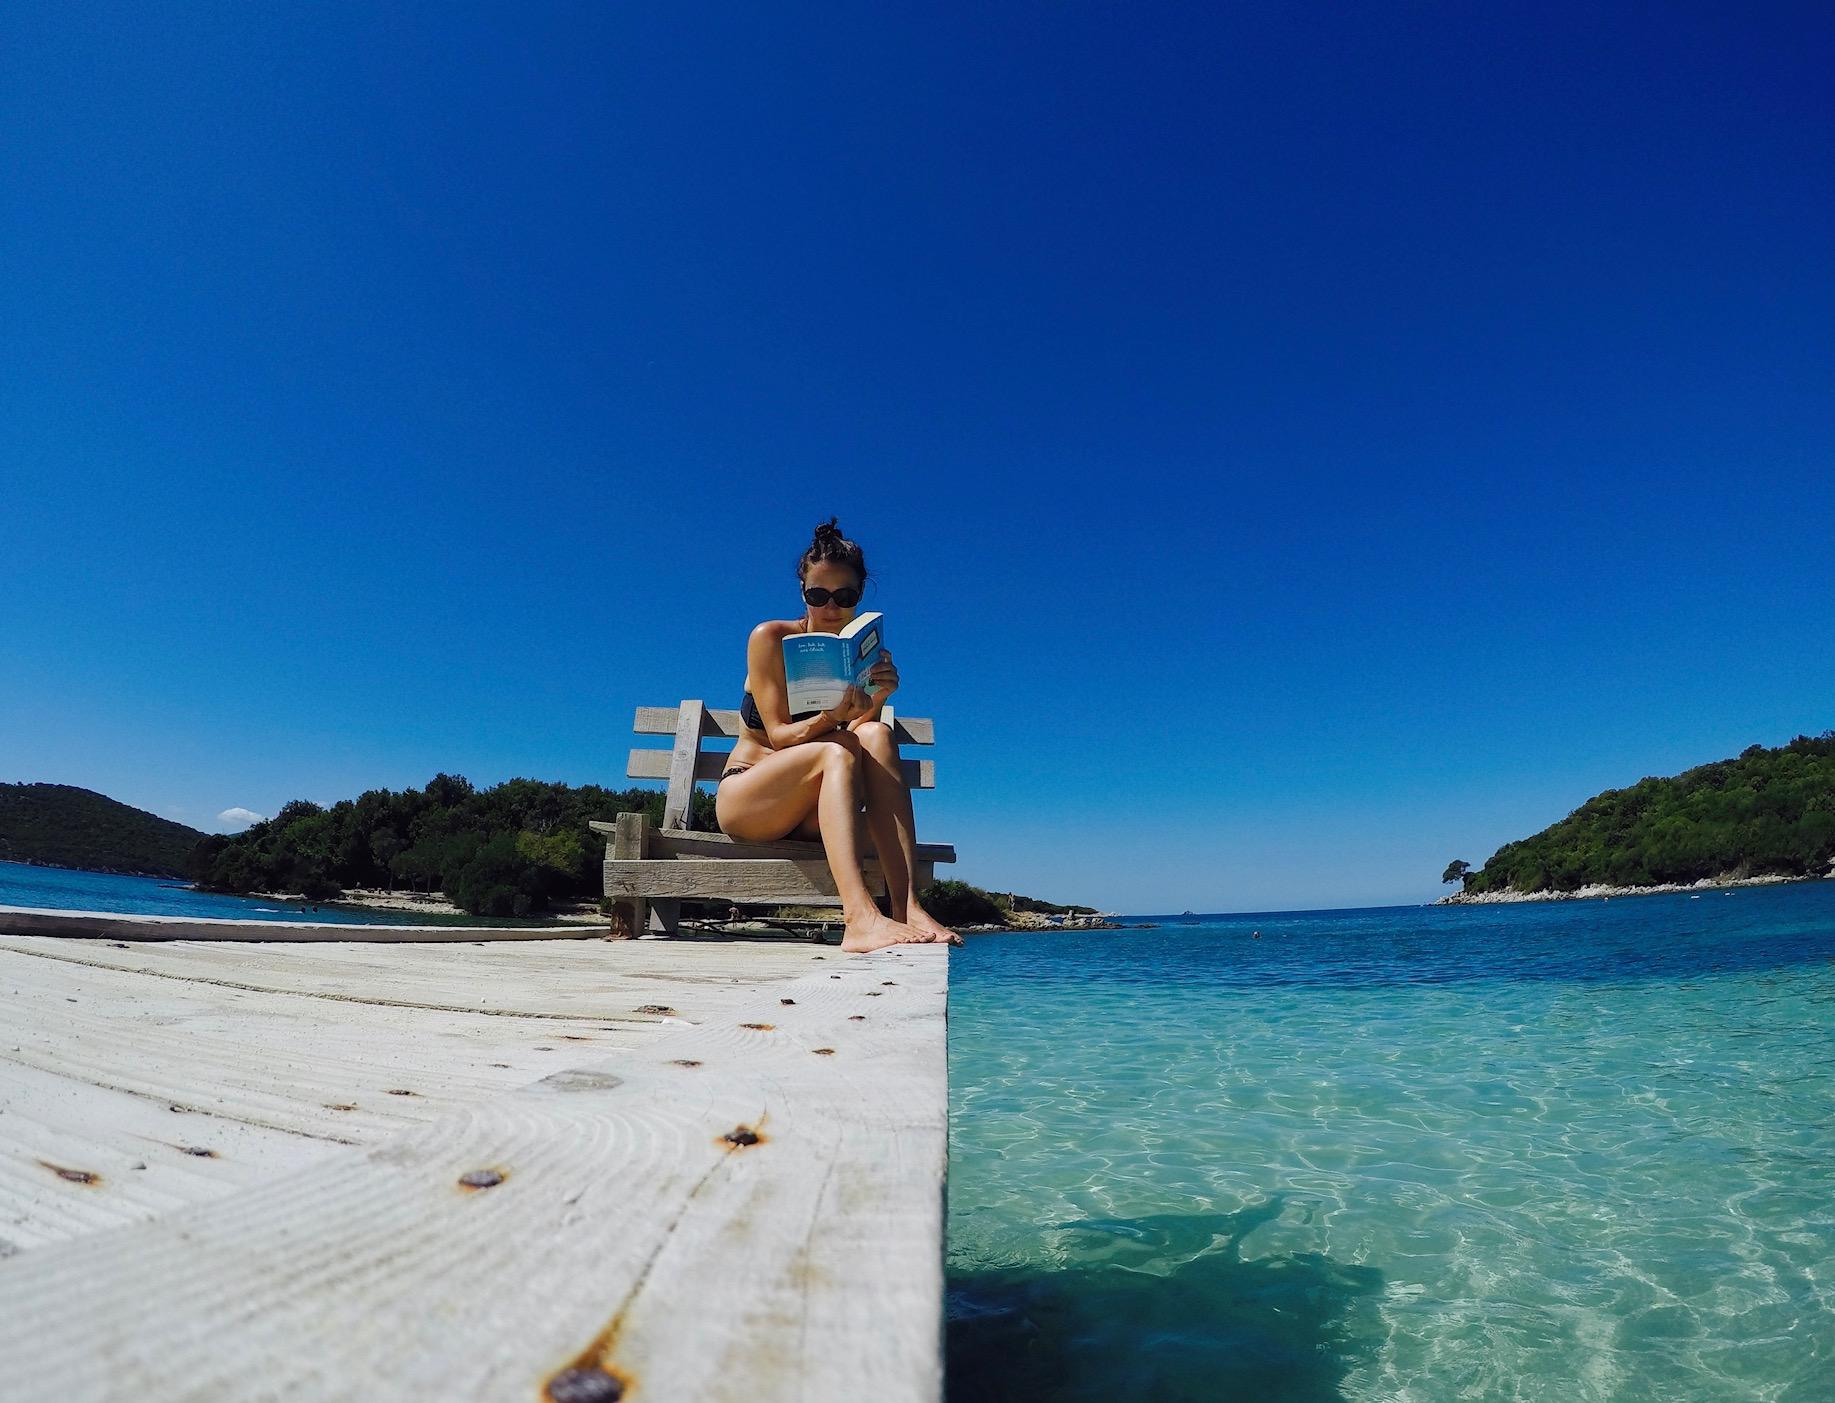 Frau auf einem Holzsteg, lesend, am Ksamil Beach, Albanien